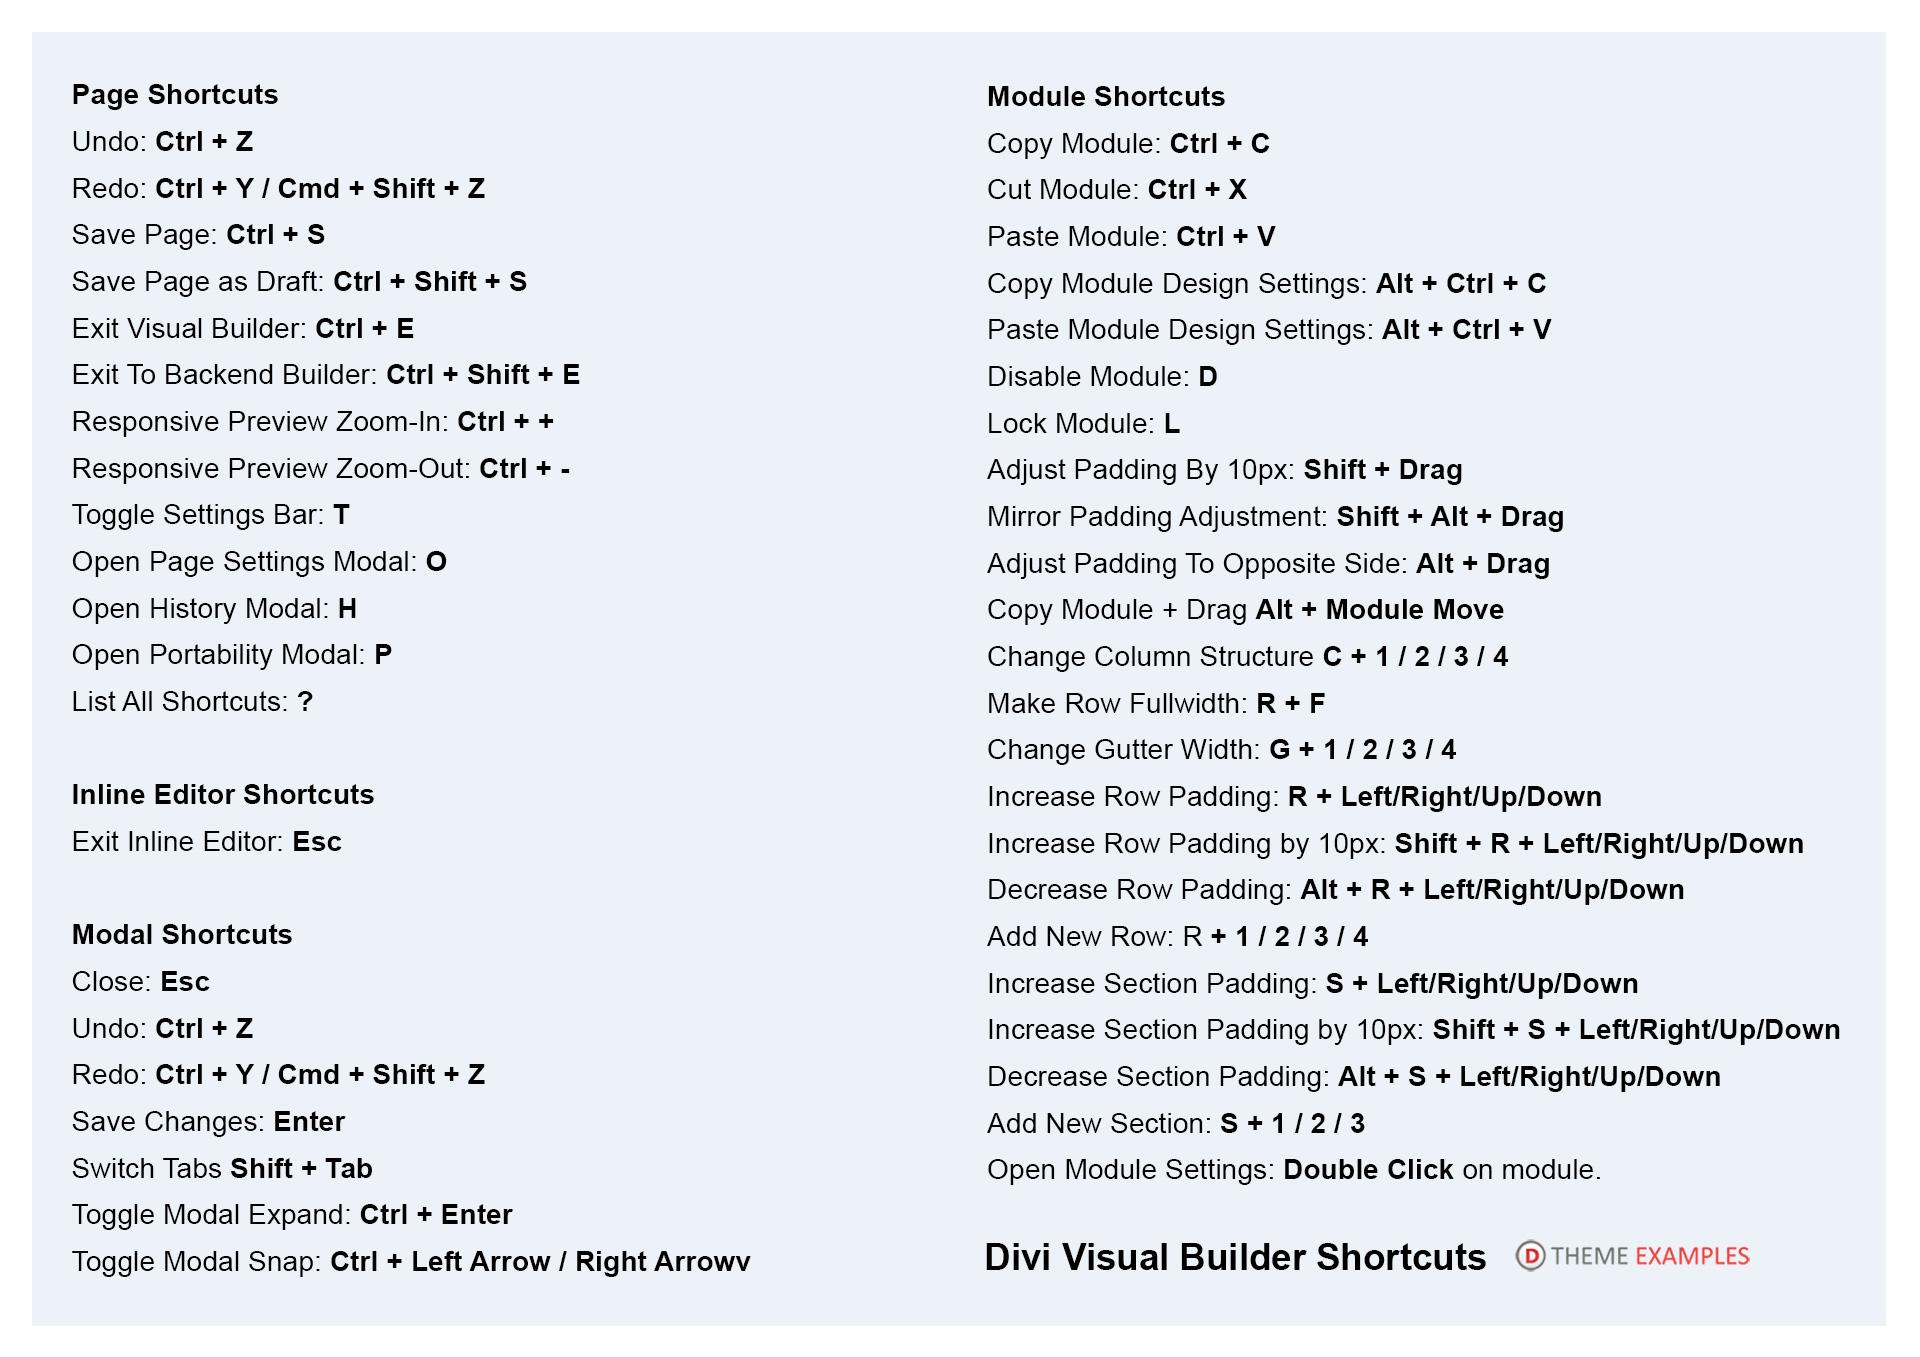 View all the Divi keyboard shortcut keys (+ Free Download)